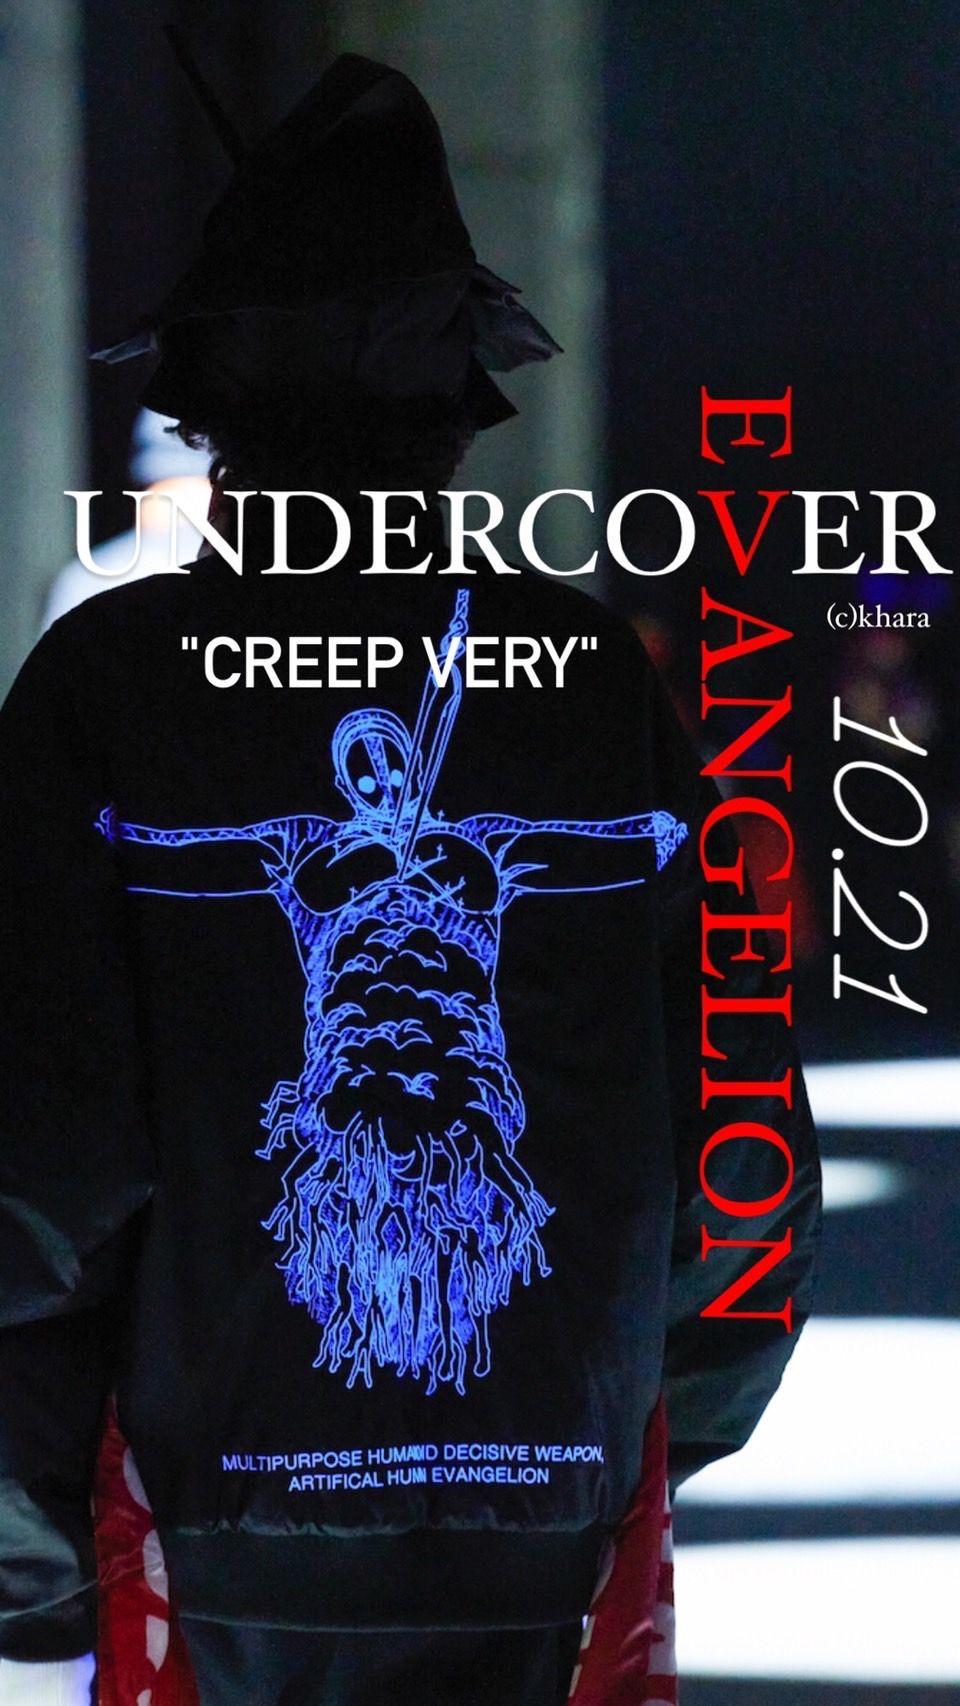 UNDERCOVER×新世紀エヴァンゲリオン/ Deliveryの写真